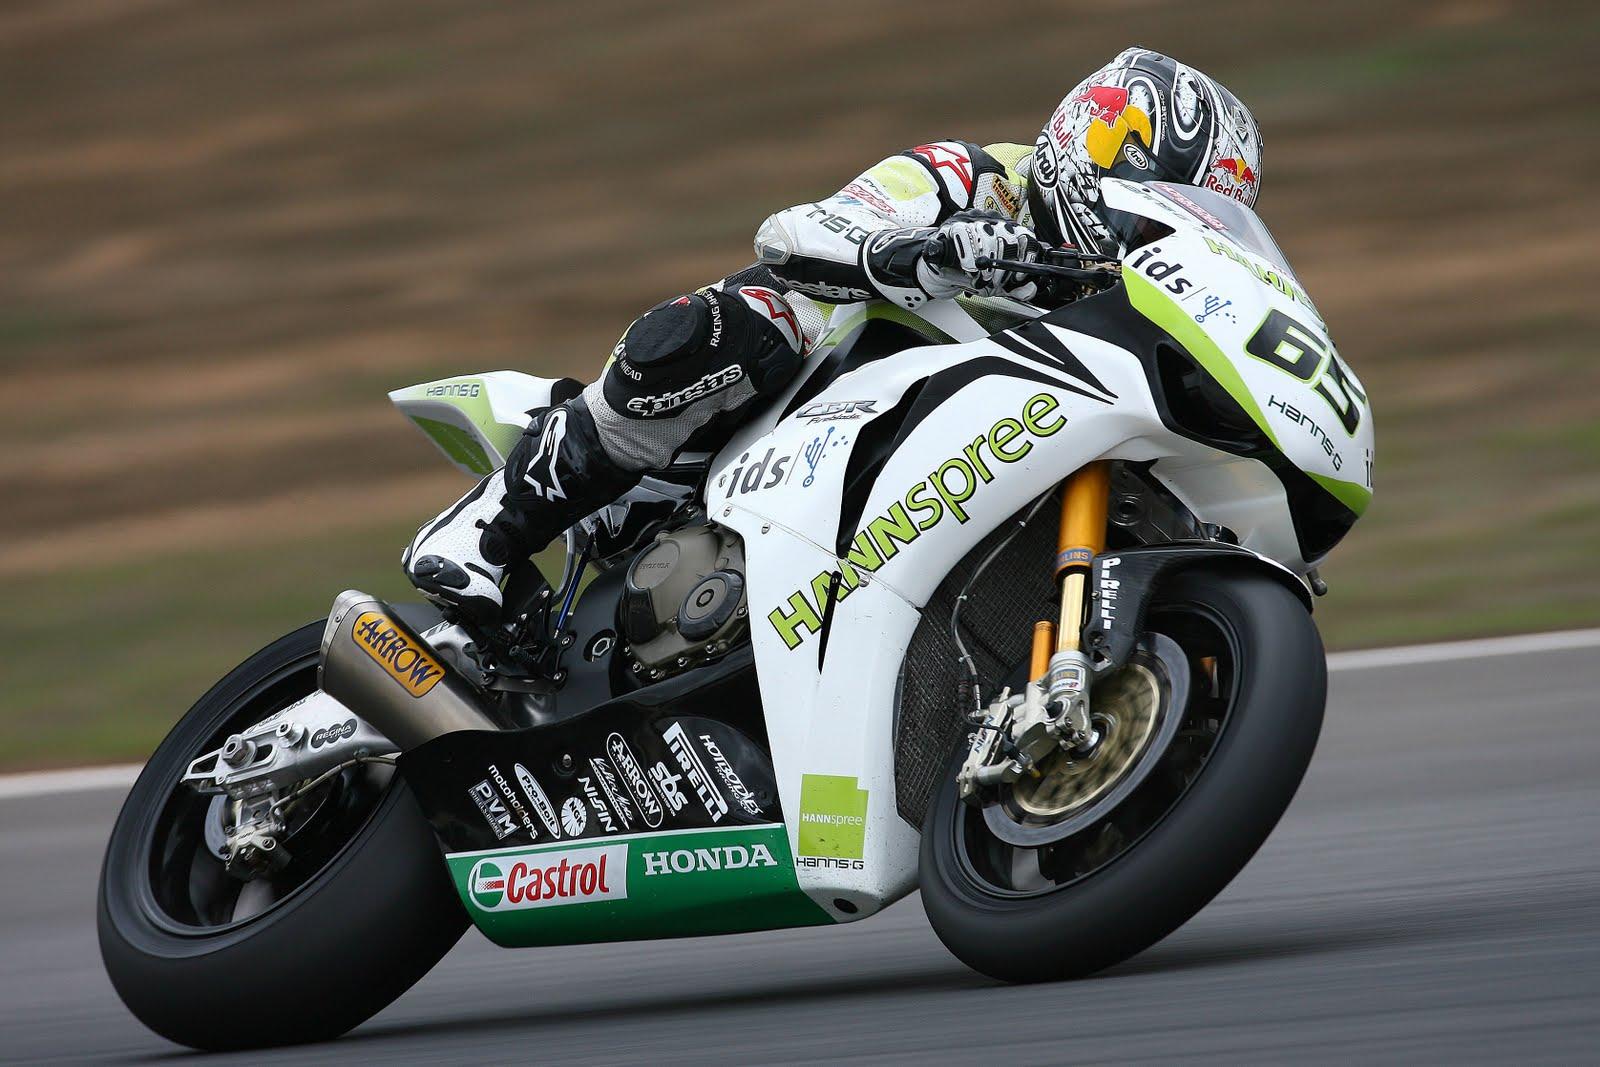 http://4.bp.blogspot.com/-qxRTQFCIHgM/TahbFWneUUI/AAAAAAAAAMg/yHpjdD9X288/s1600/Jonathan+Rea+in+Honda+CBR1000RR+Fireblade.jpg